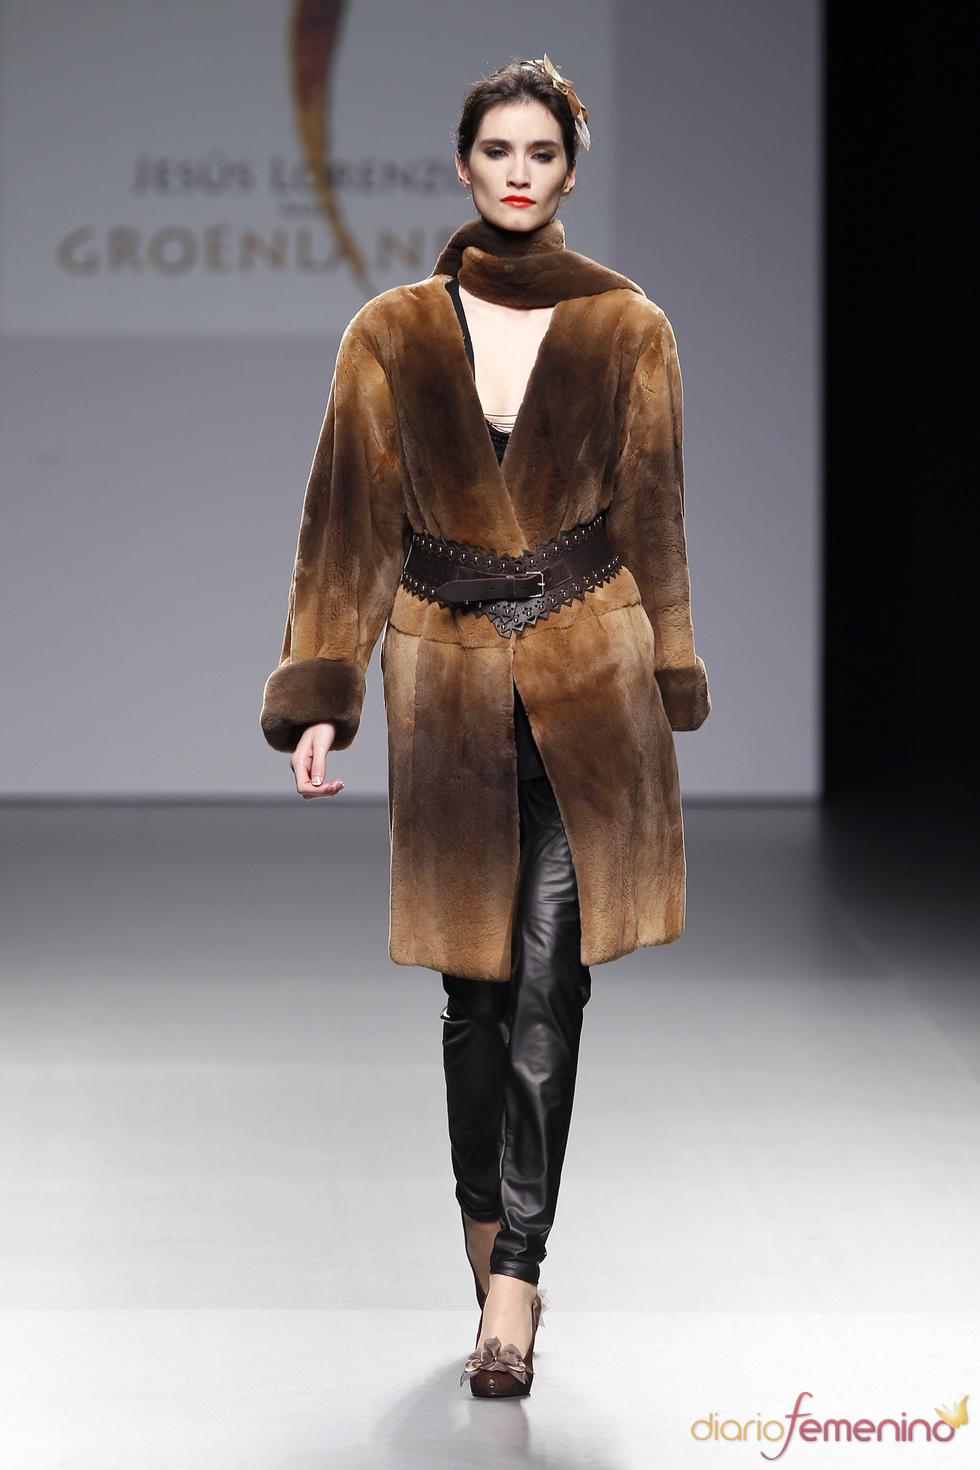 Fotos Moda: Jesús Lorenzo en Cibeles Madrid Fashion Week